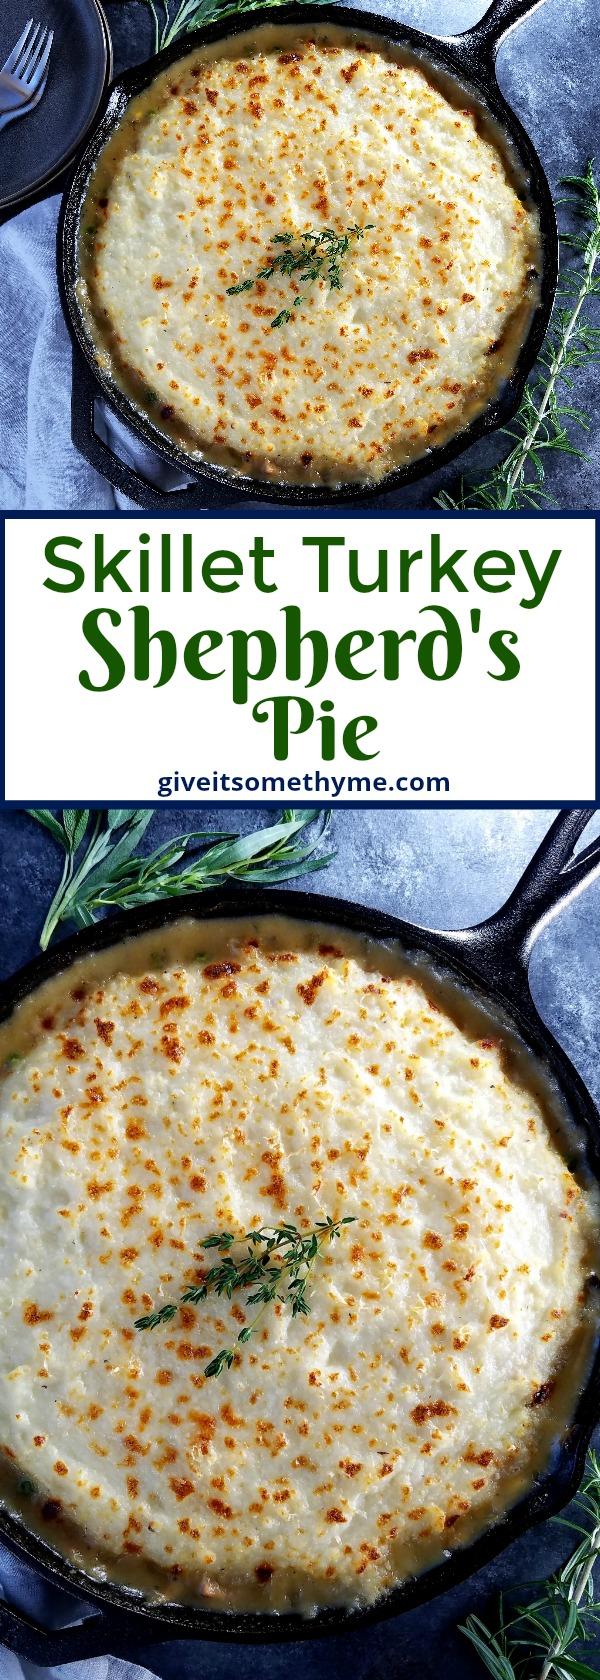 Skillet Turkey Shepherd's Pie - Give it Some Thyme